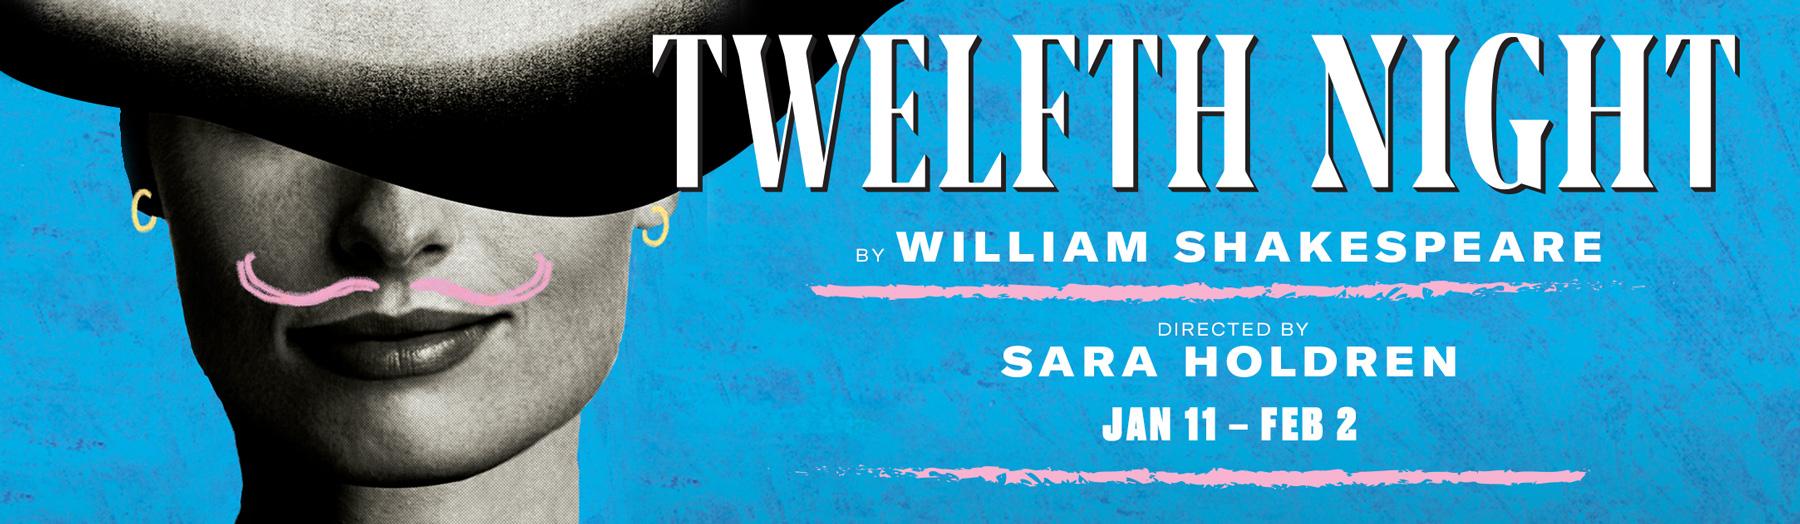 Twelfth-Night-2166x630